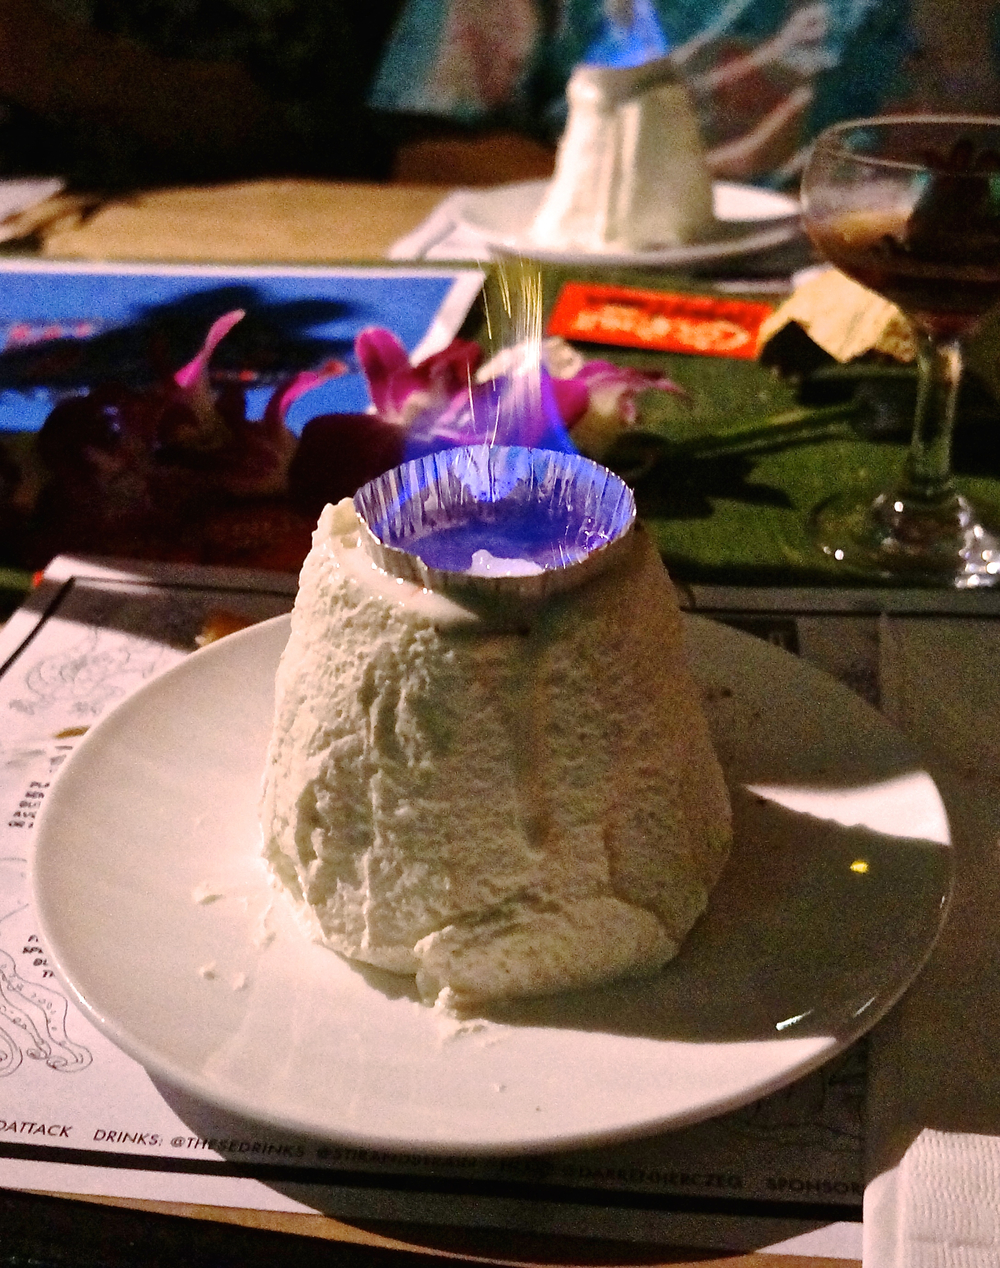 coconut-club-volcano-cake.jpg